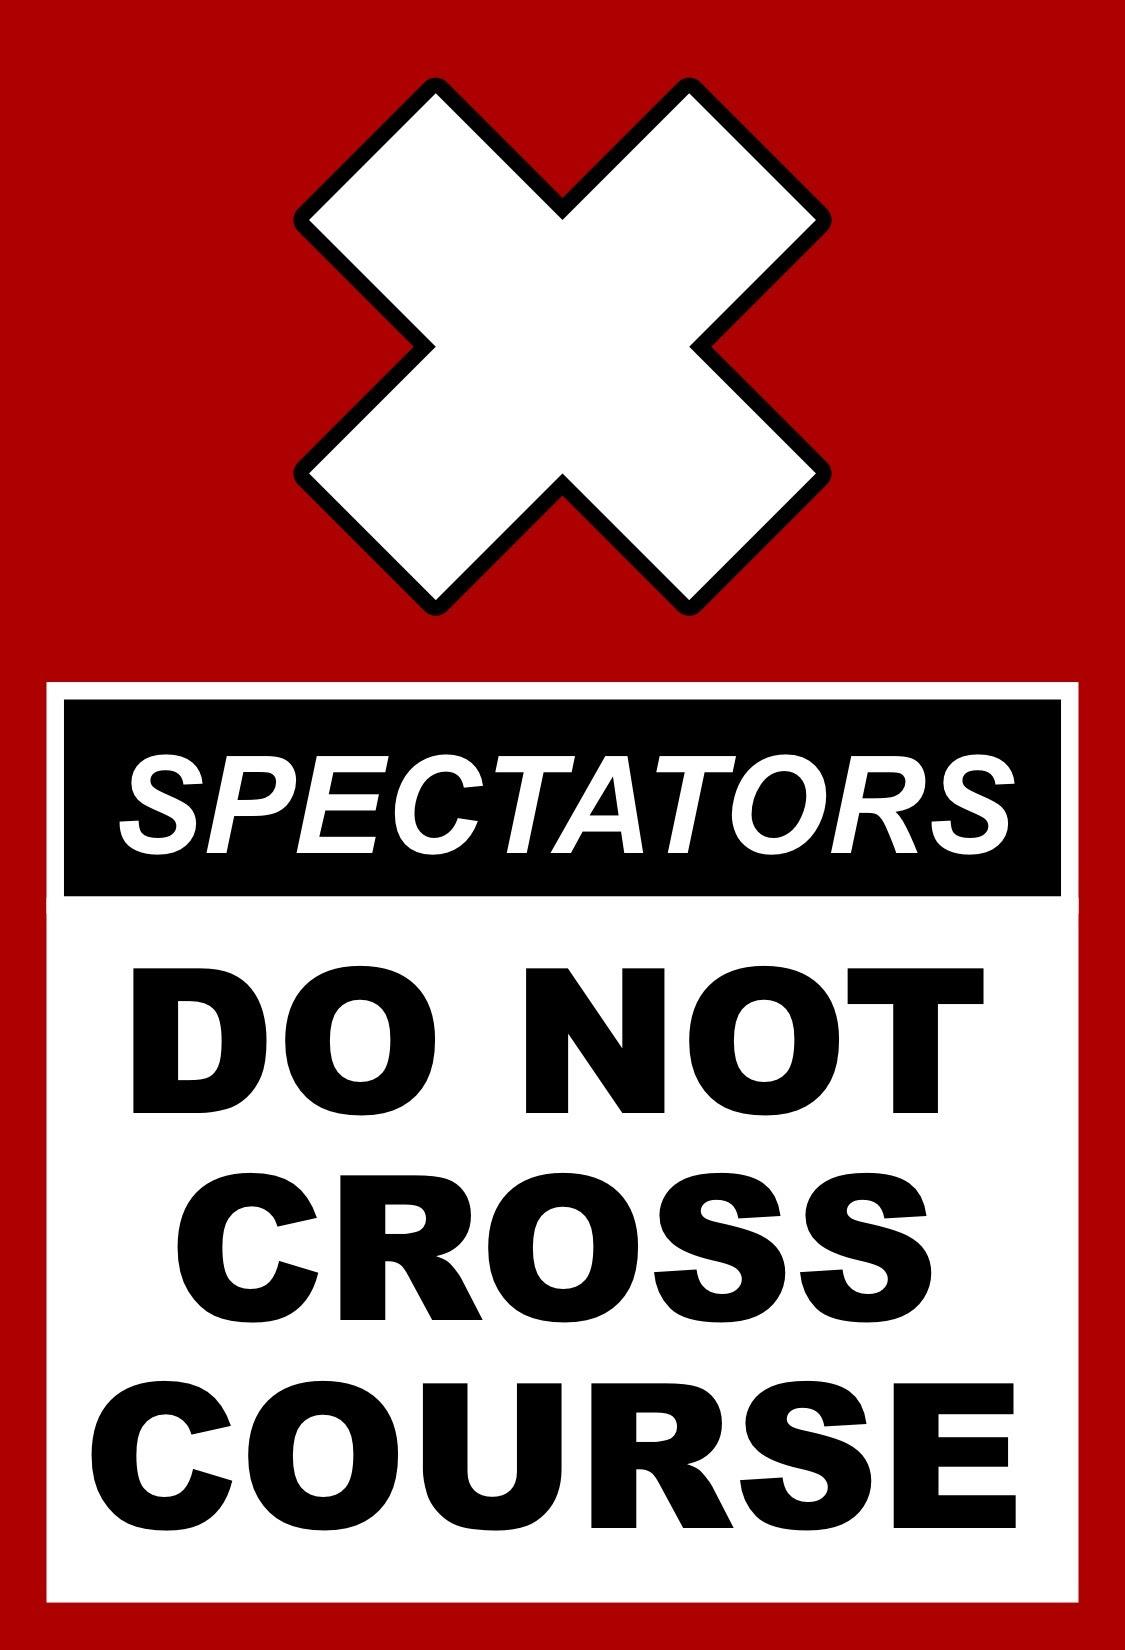 SpectatorSign 003